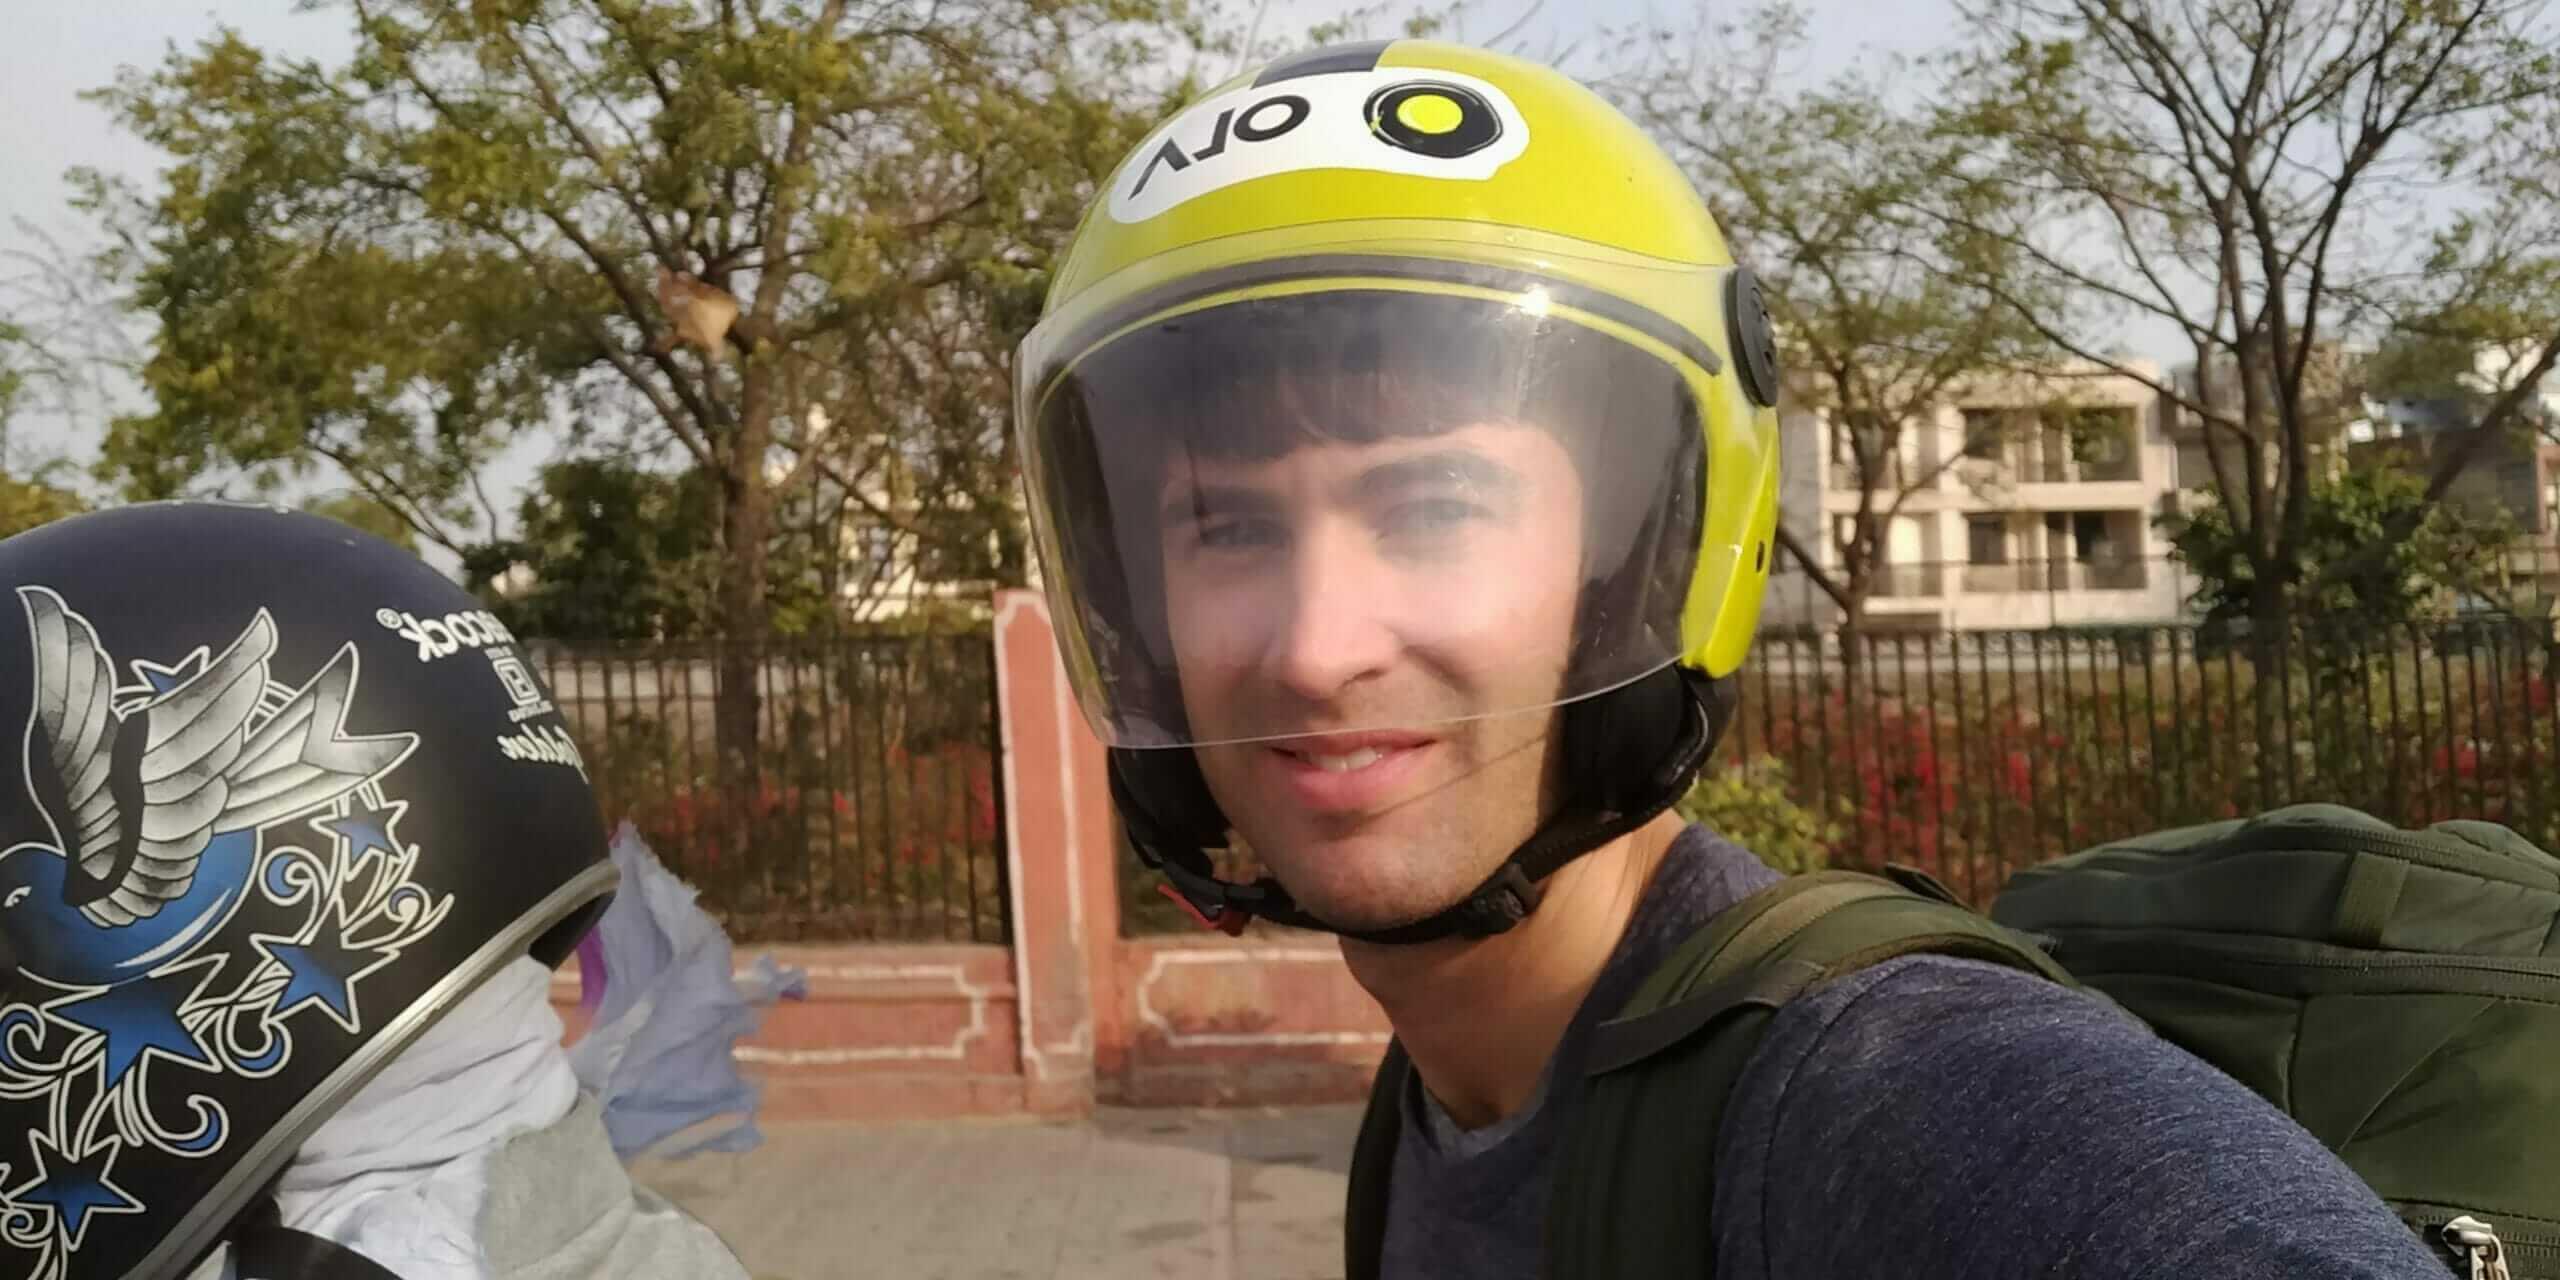 uberMOTO trip in Jaipur, India ironically with an Ola helmet